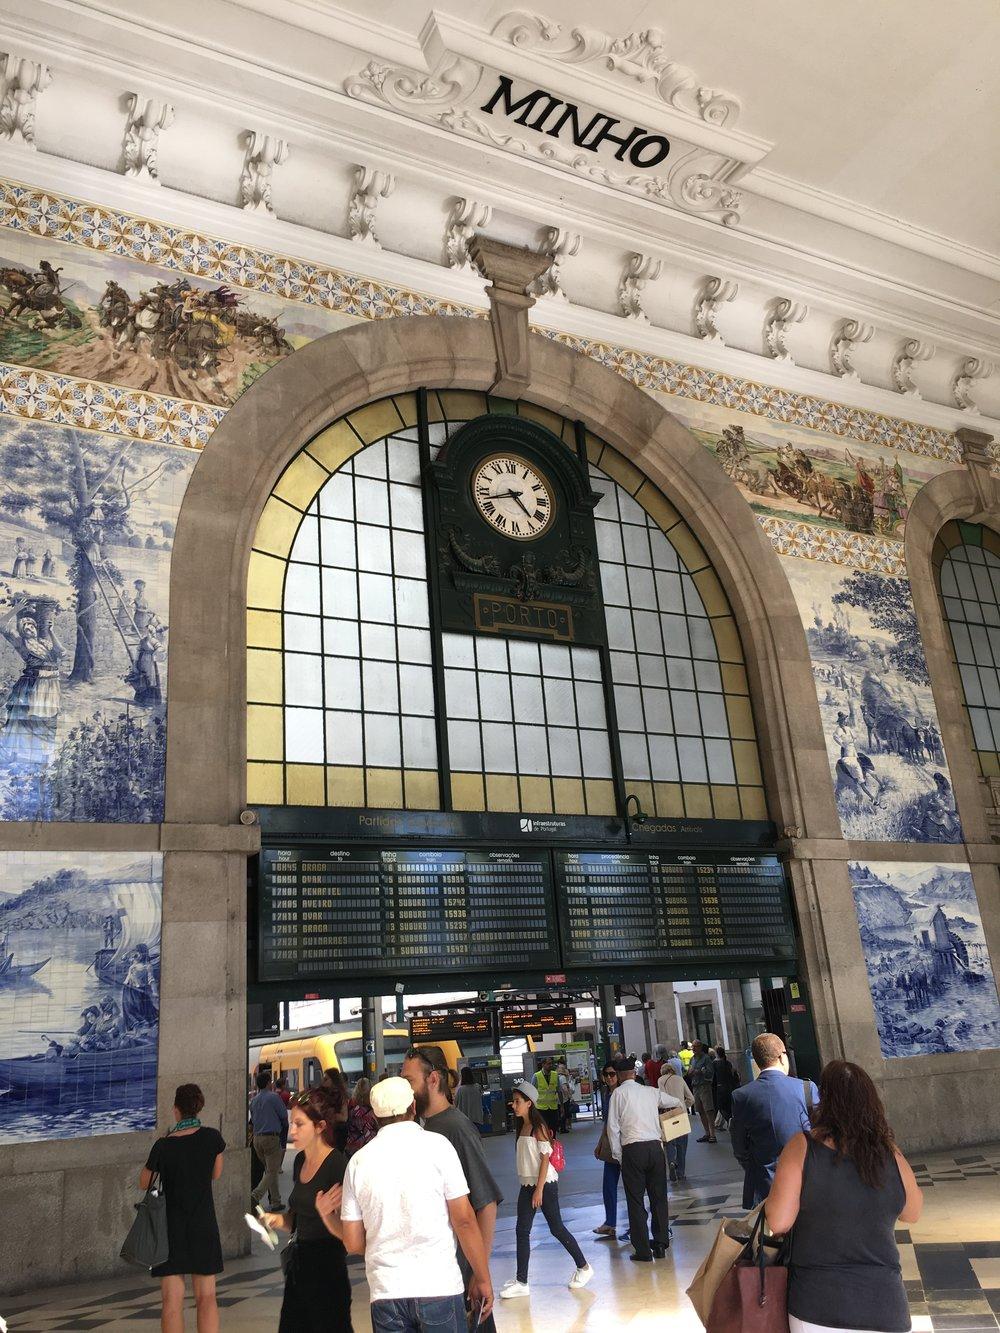 Sao-Bento-railway-station.jpg